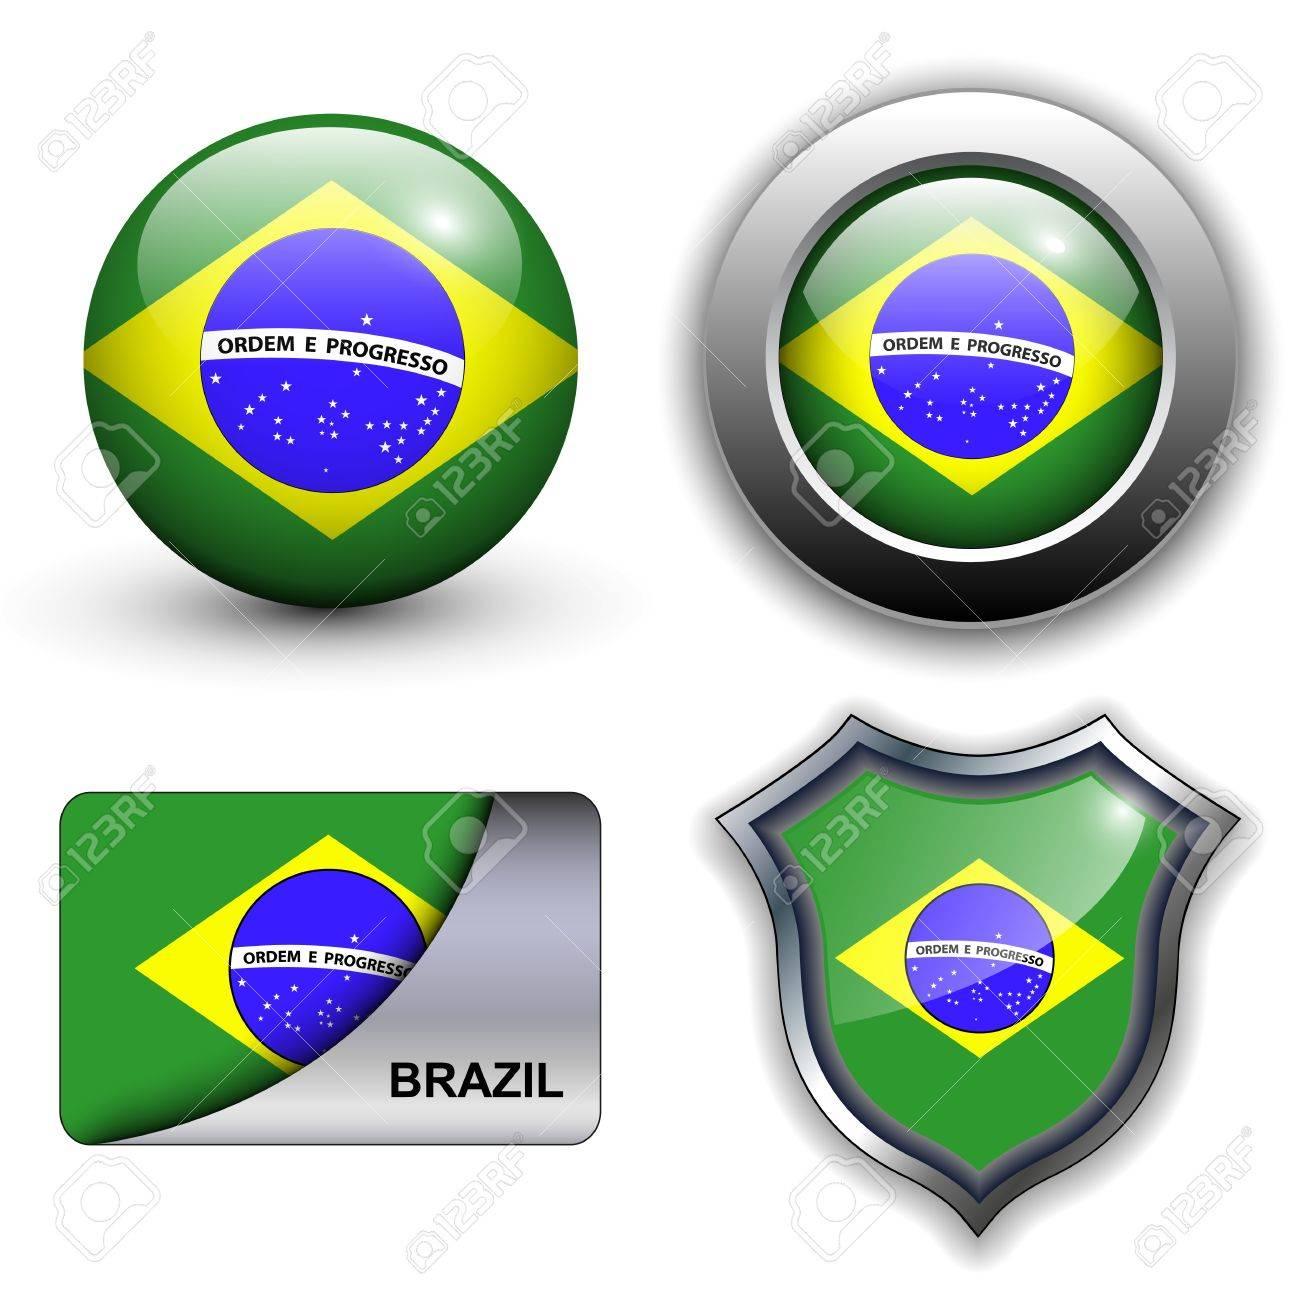 Handmade watercolor brazil flag brasil stock photos freeimages com - Brazil Flag Business Brazil Flag Icons Theme